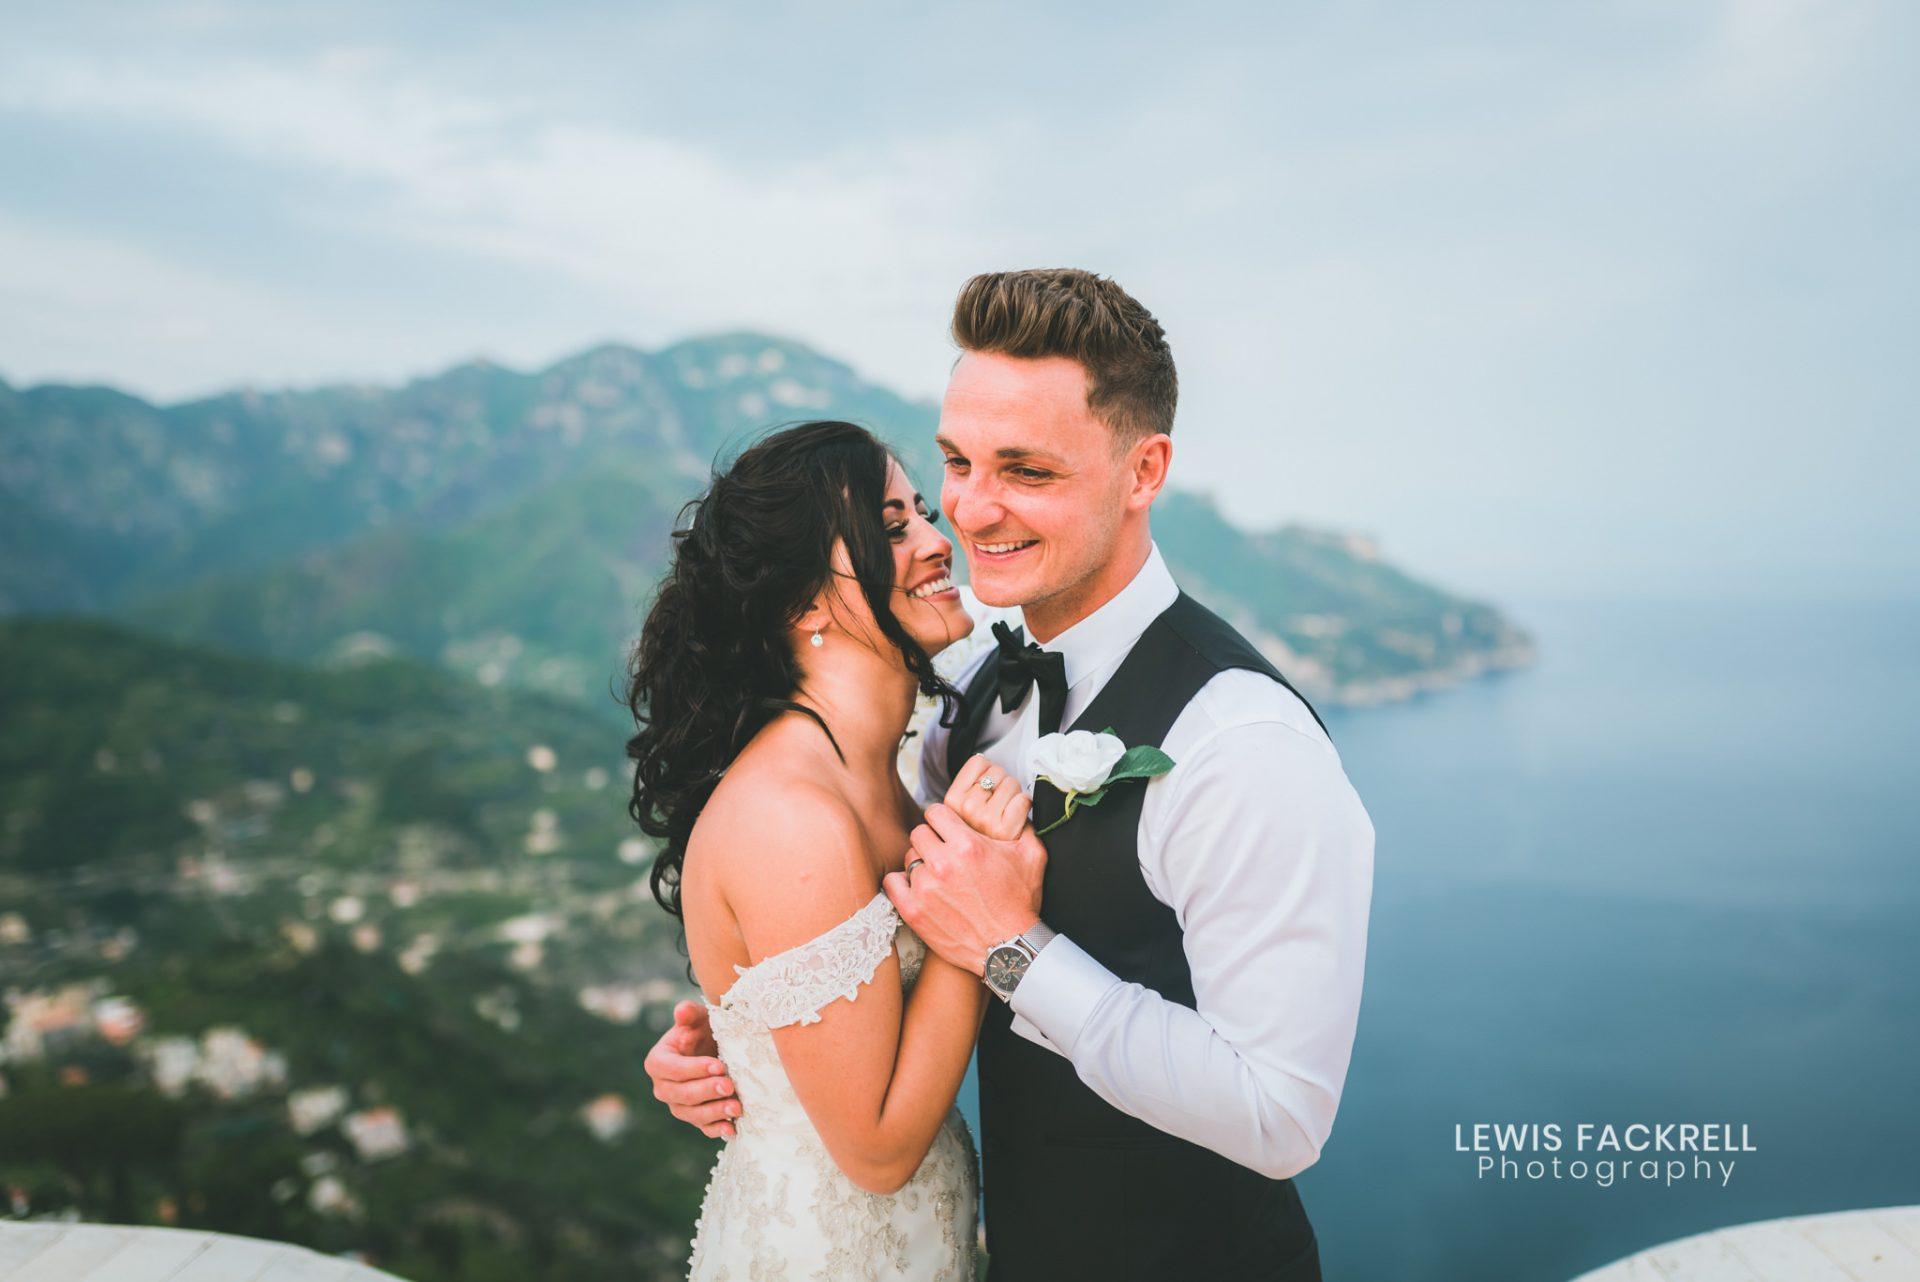 Couple stood on balcony at Ravello Destination wedding in Italy